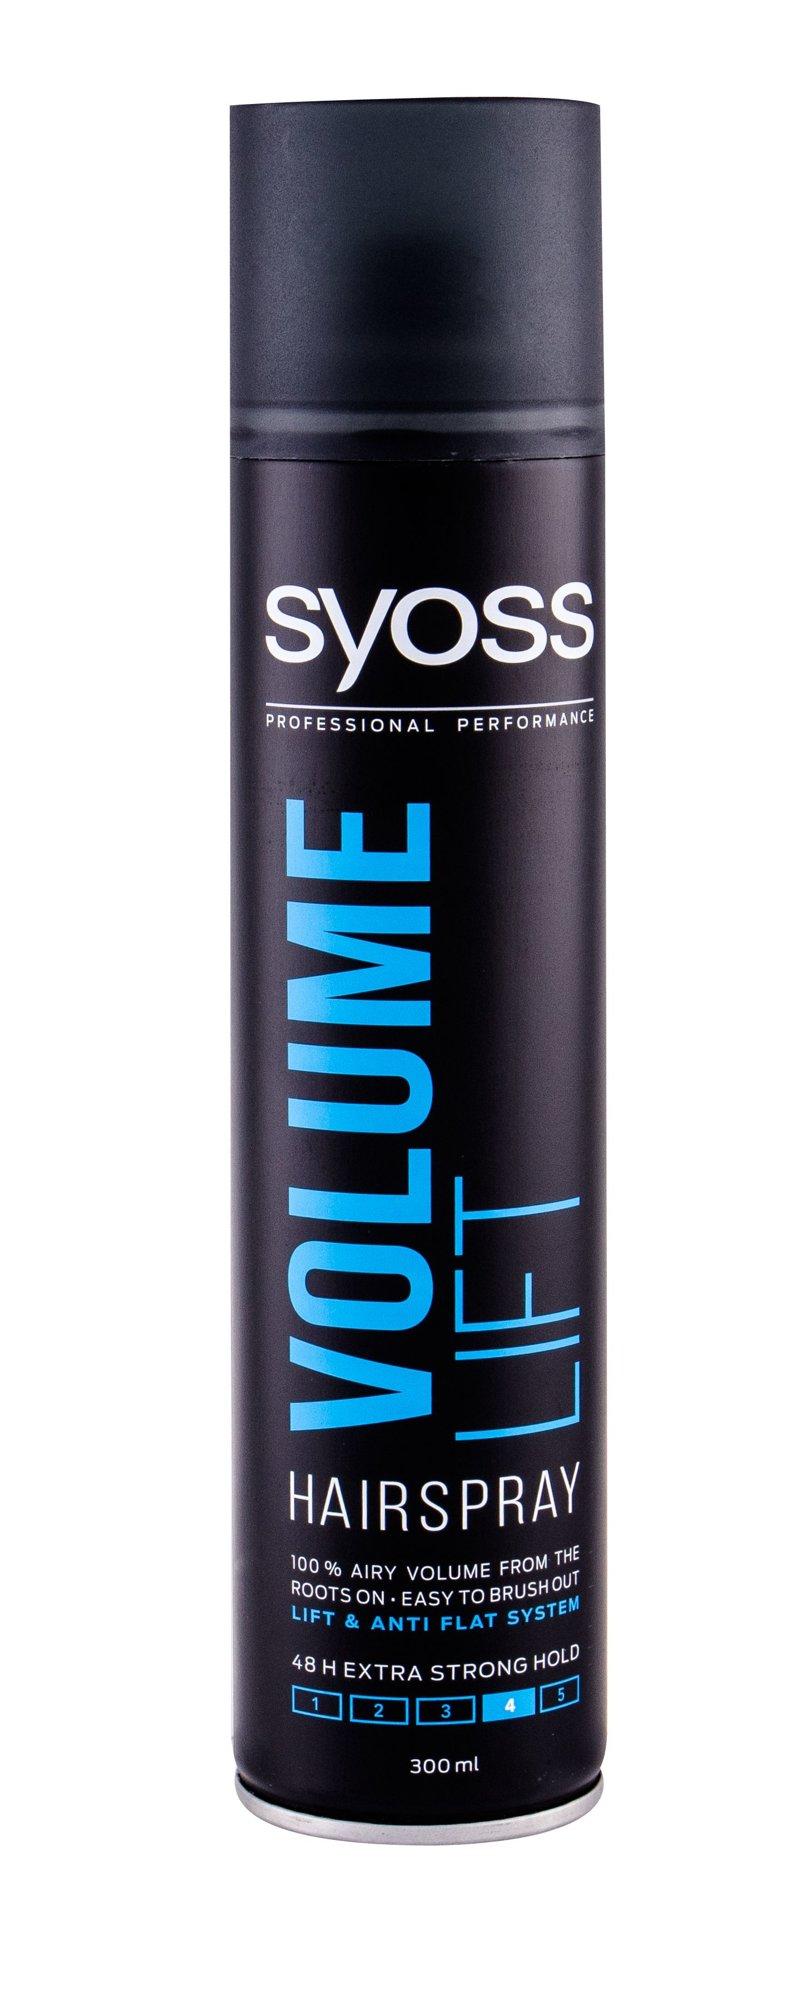 Syoss Professional Performance Volume Lift Hair Spray 300ml